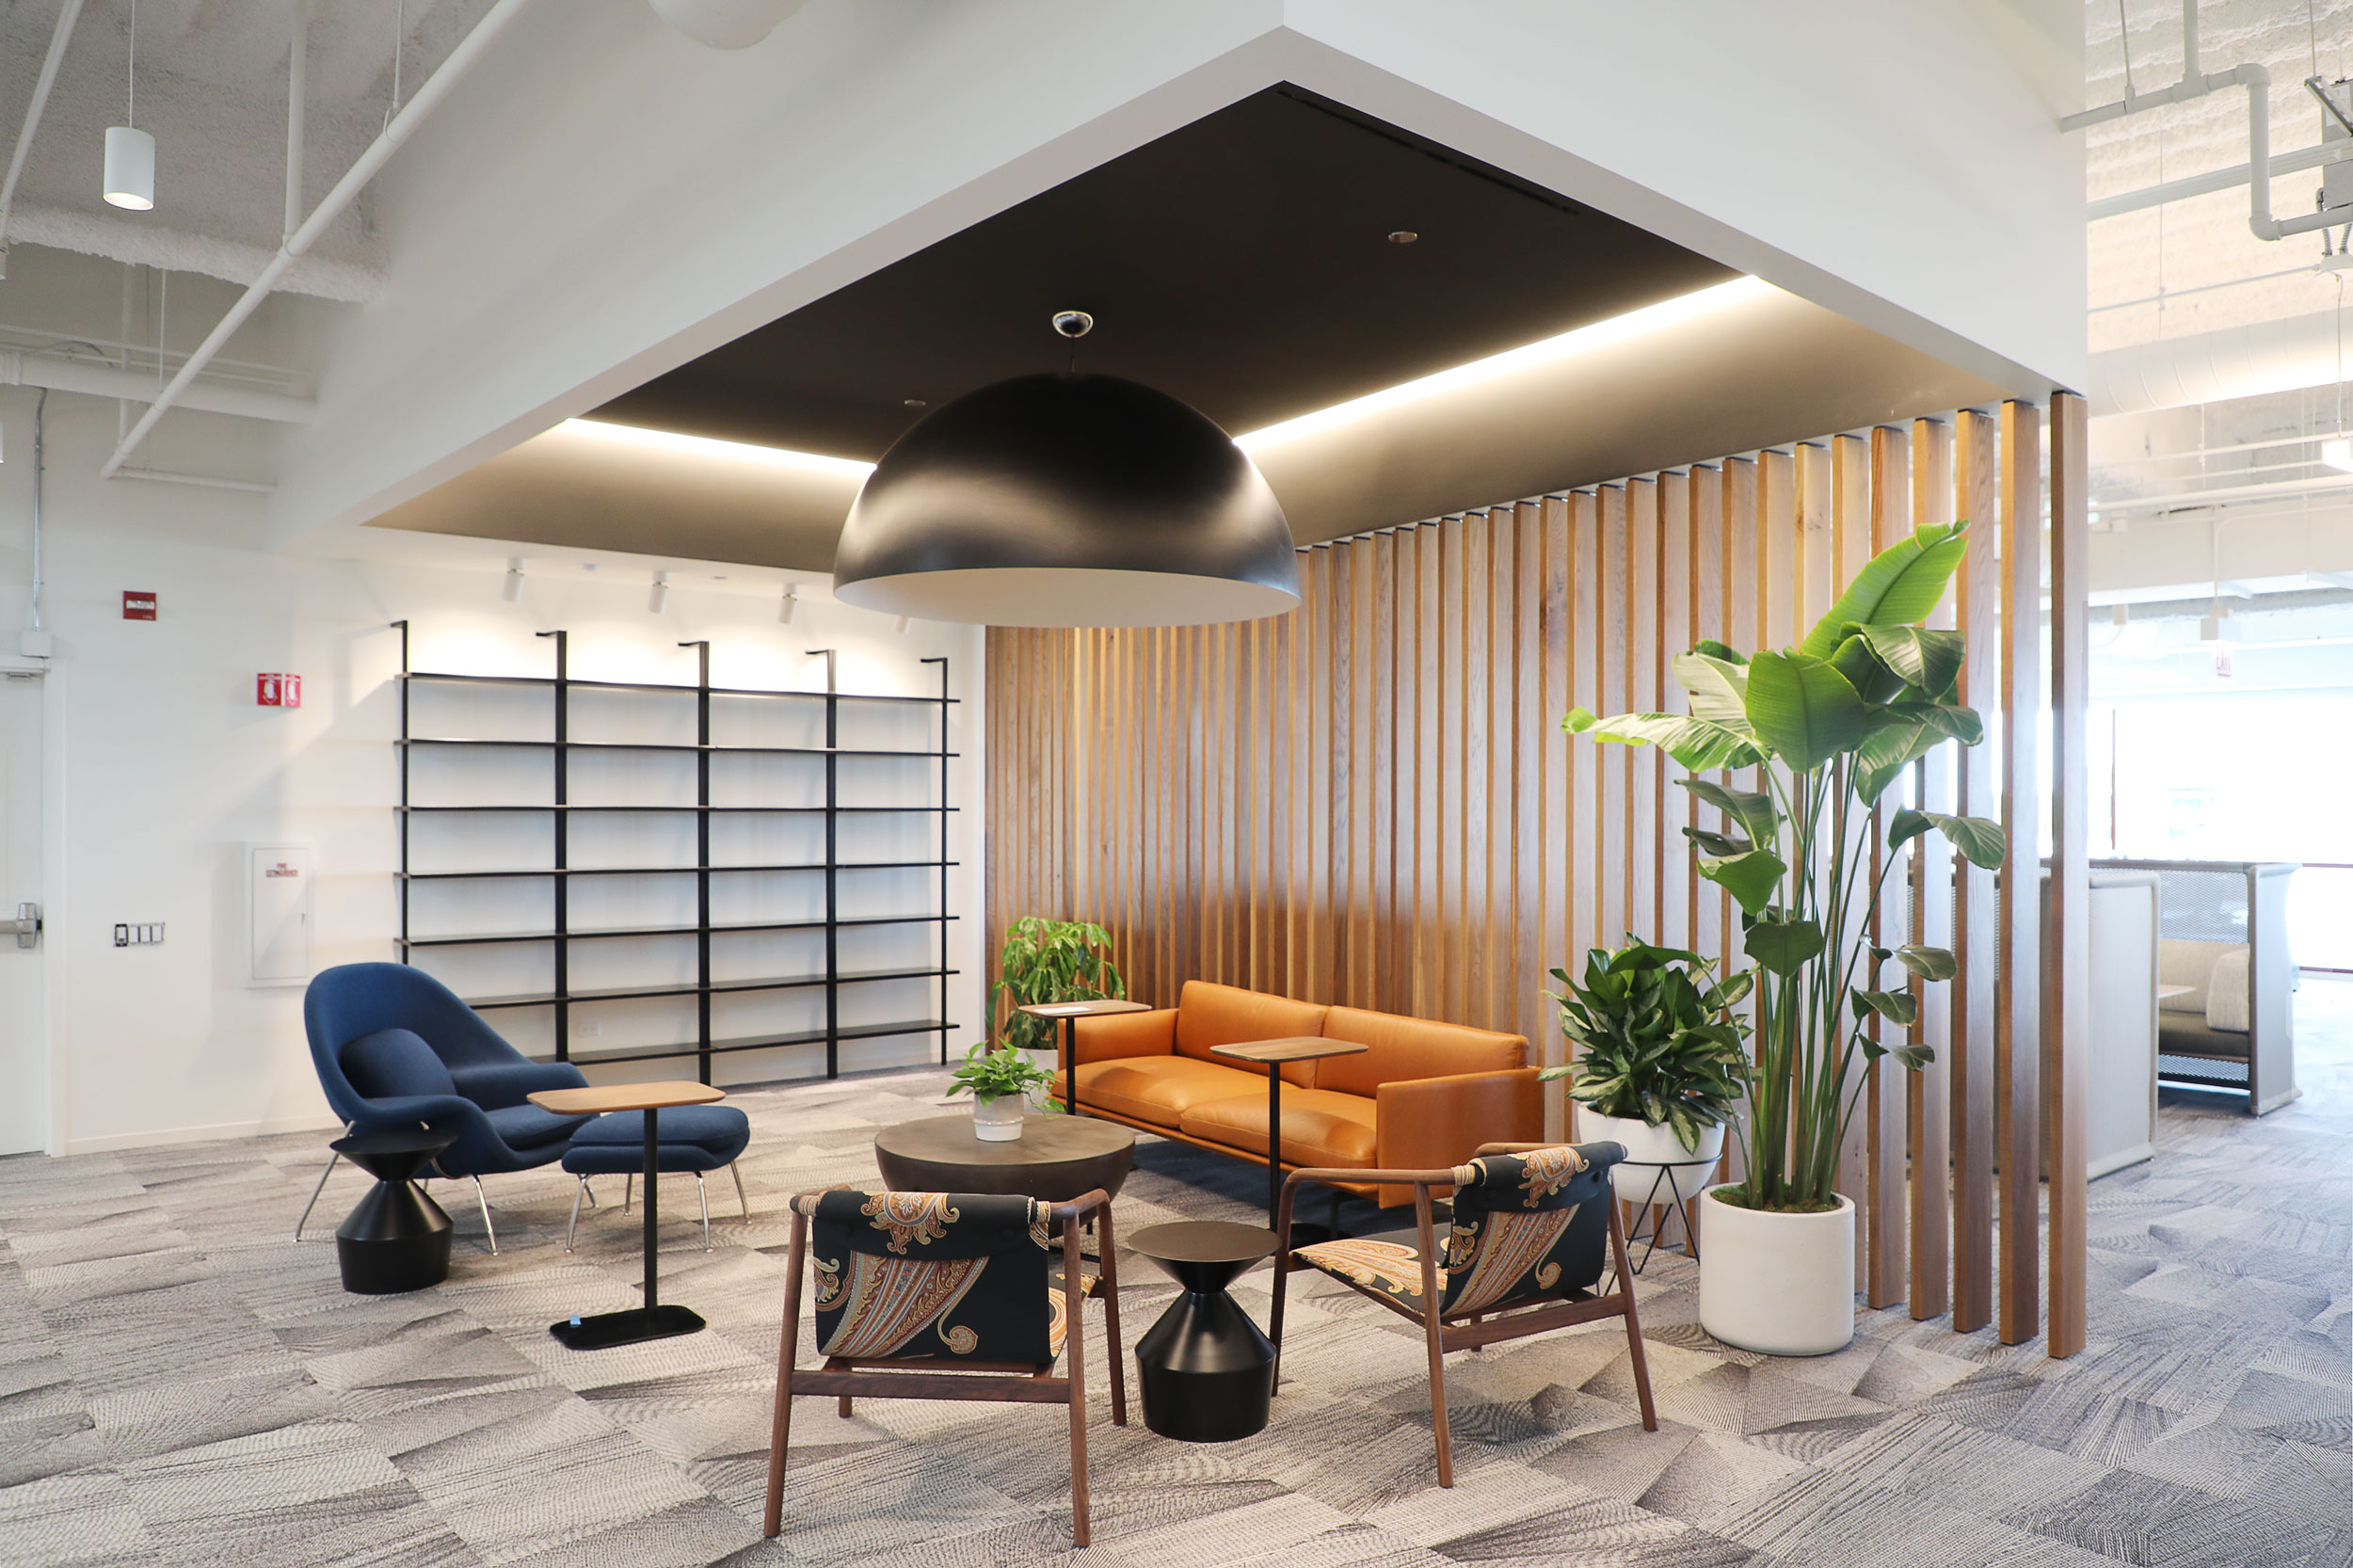 Skender Completes Renovation of WBEZ Headquarters